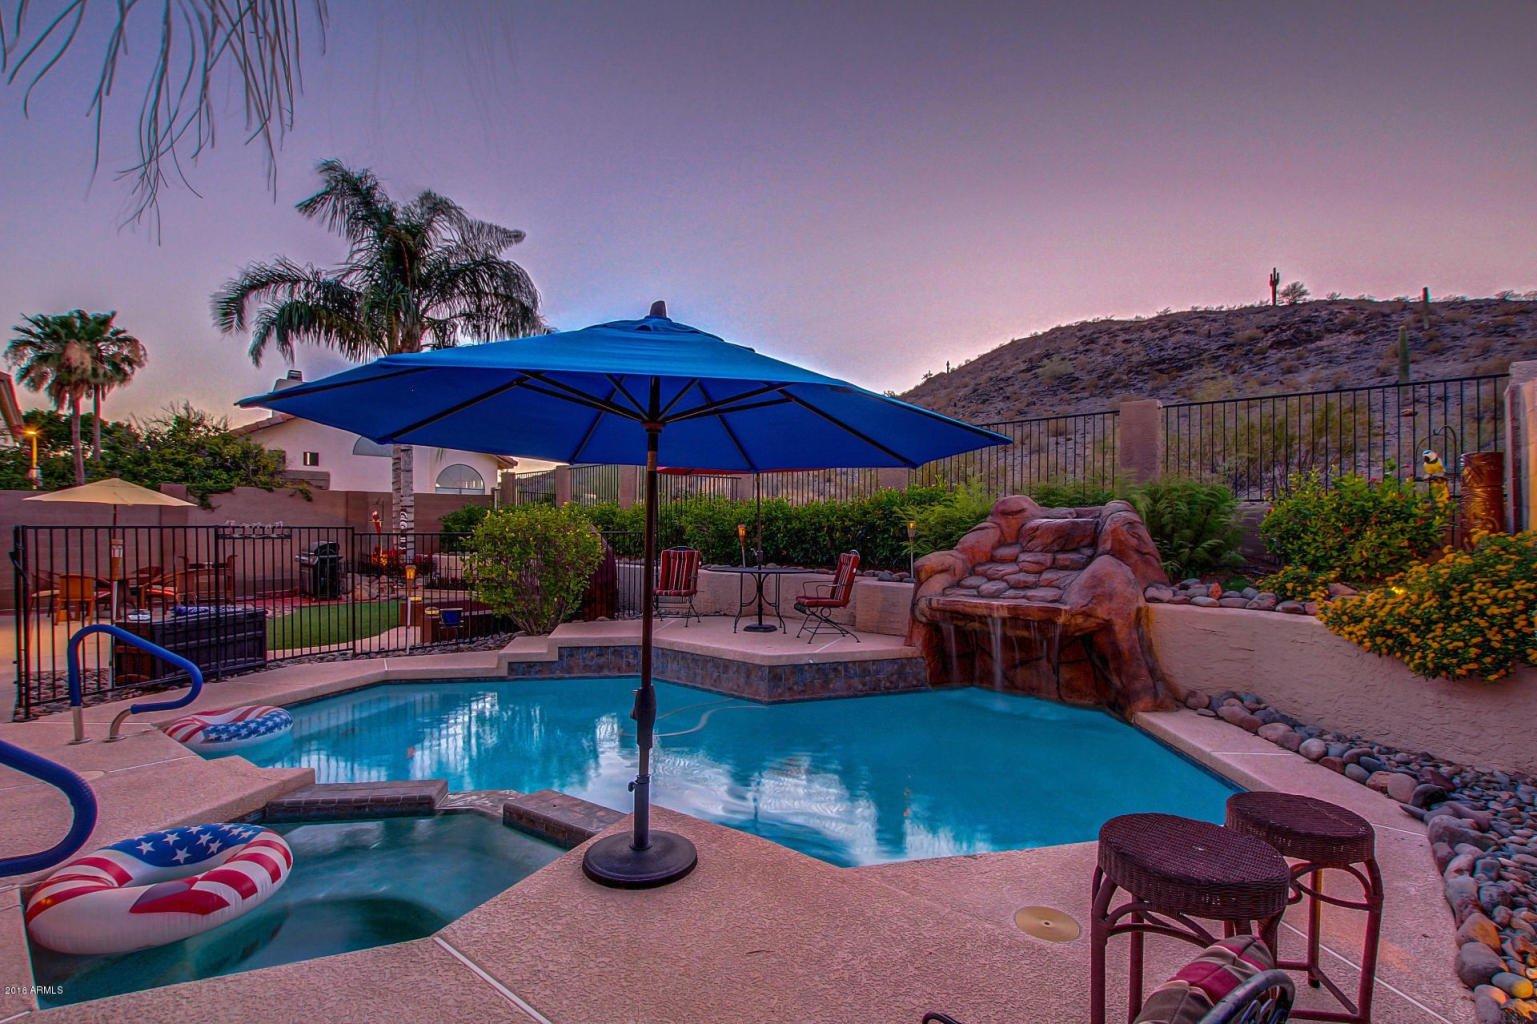 Photo 18: Photos: 3602 E Mountain Sky Avenue in Phoenix: Ahwatukee House for sale : MLS®# 5462780